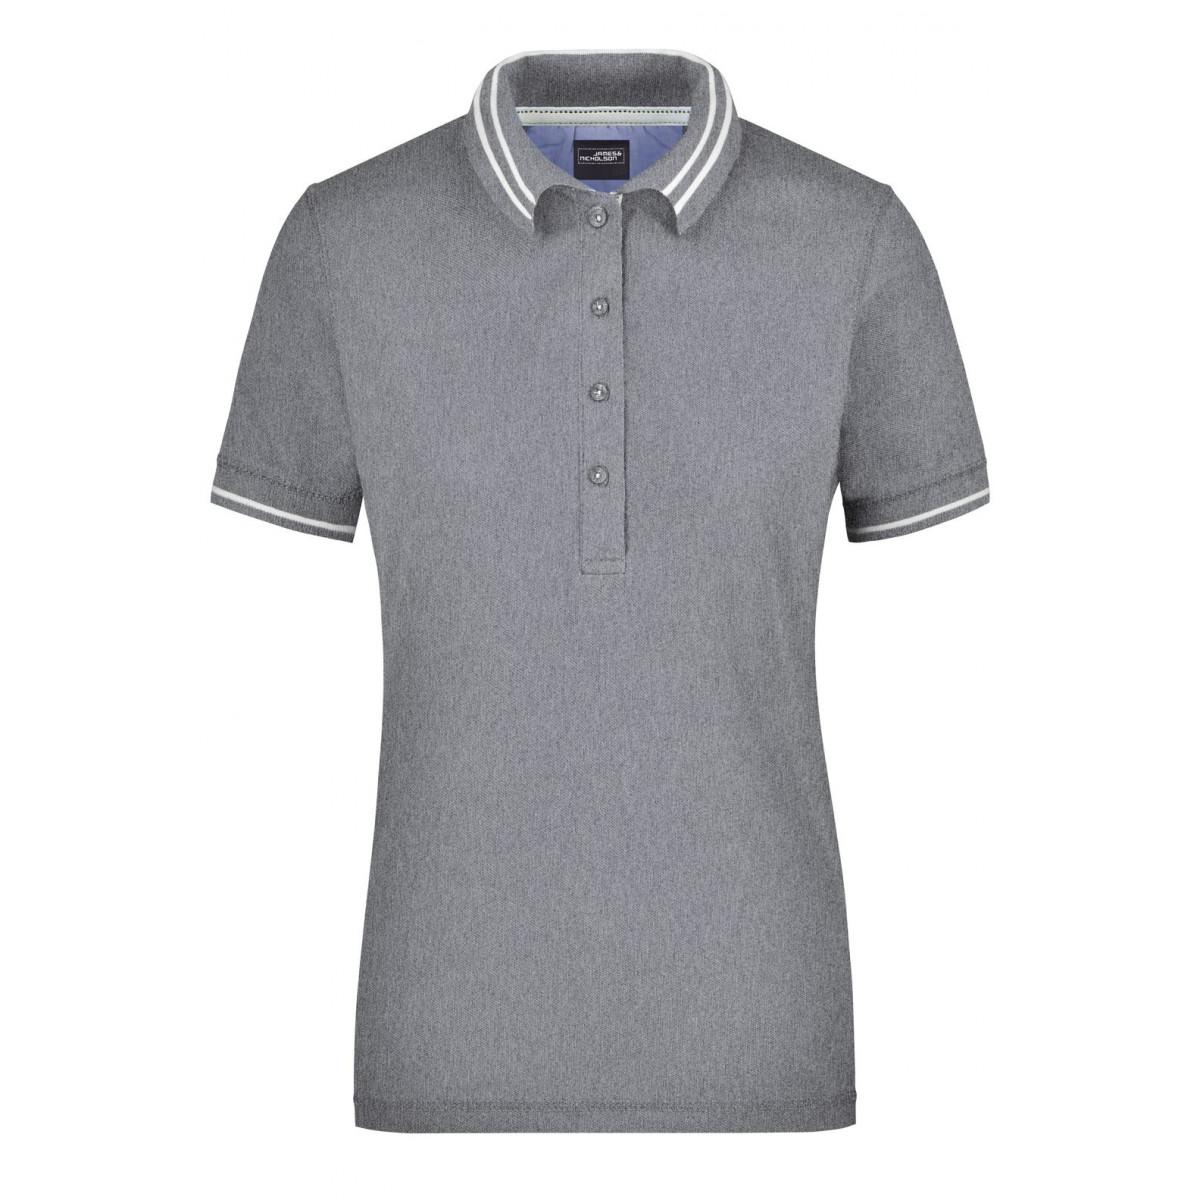 Рубашка поло женская JN946 Ladies Lifestyle Polo - Серый меланж/Белый